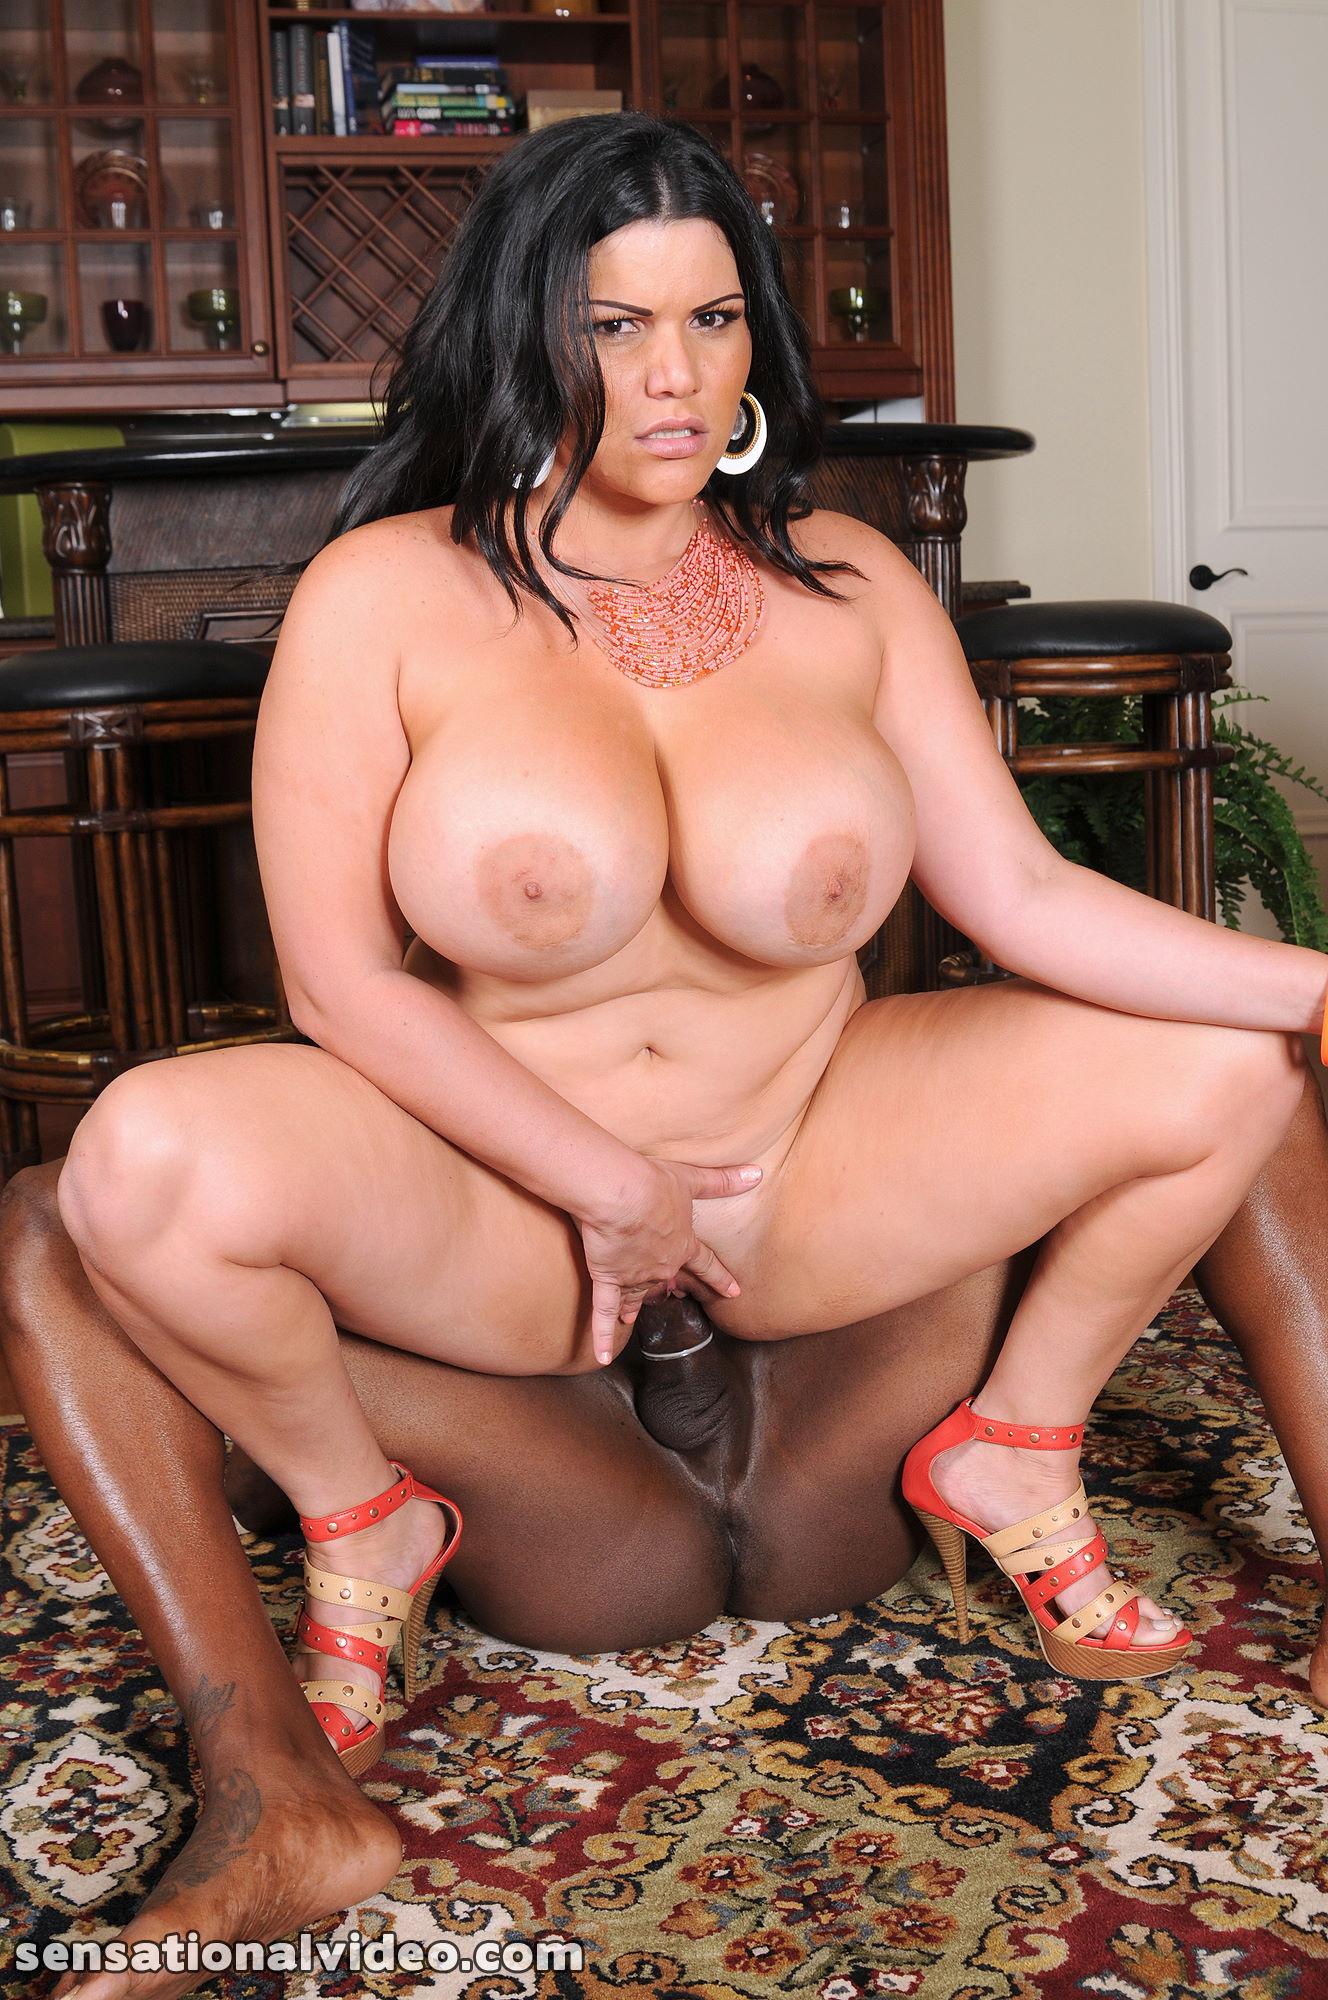 BBWs Angelina Castro & Samantha 38G Fuck A Big Cock! Porn Films